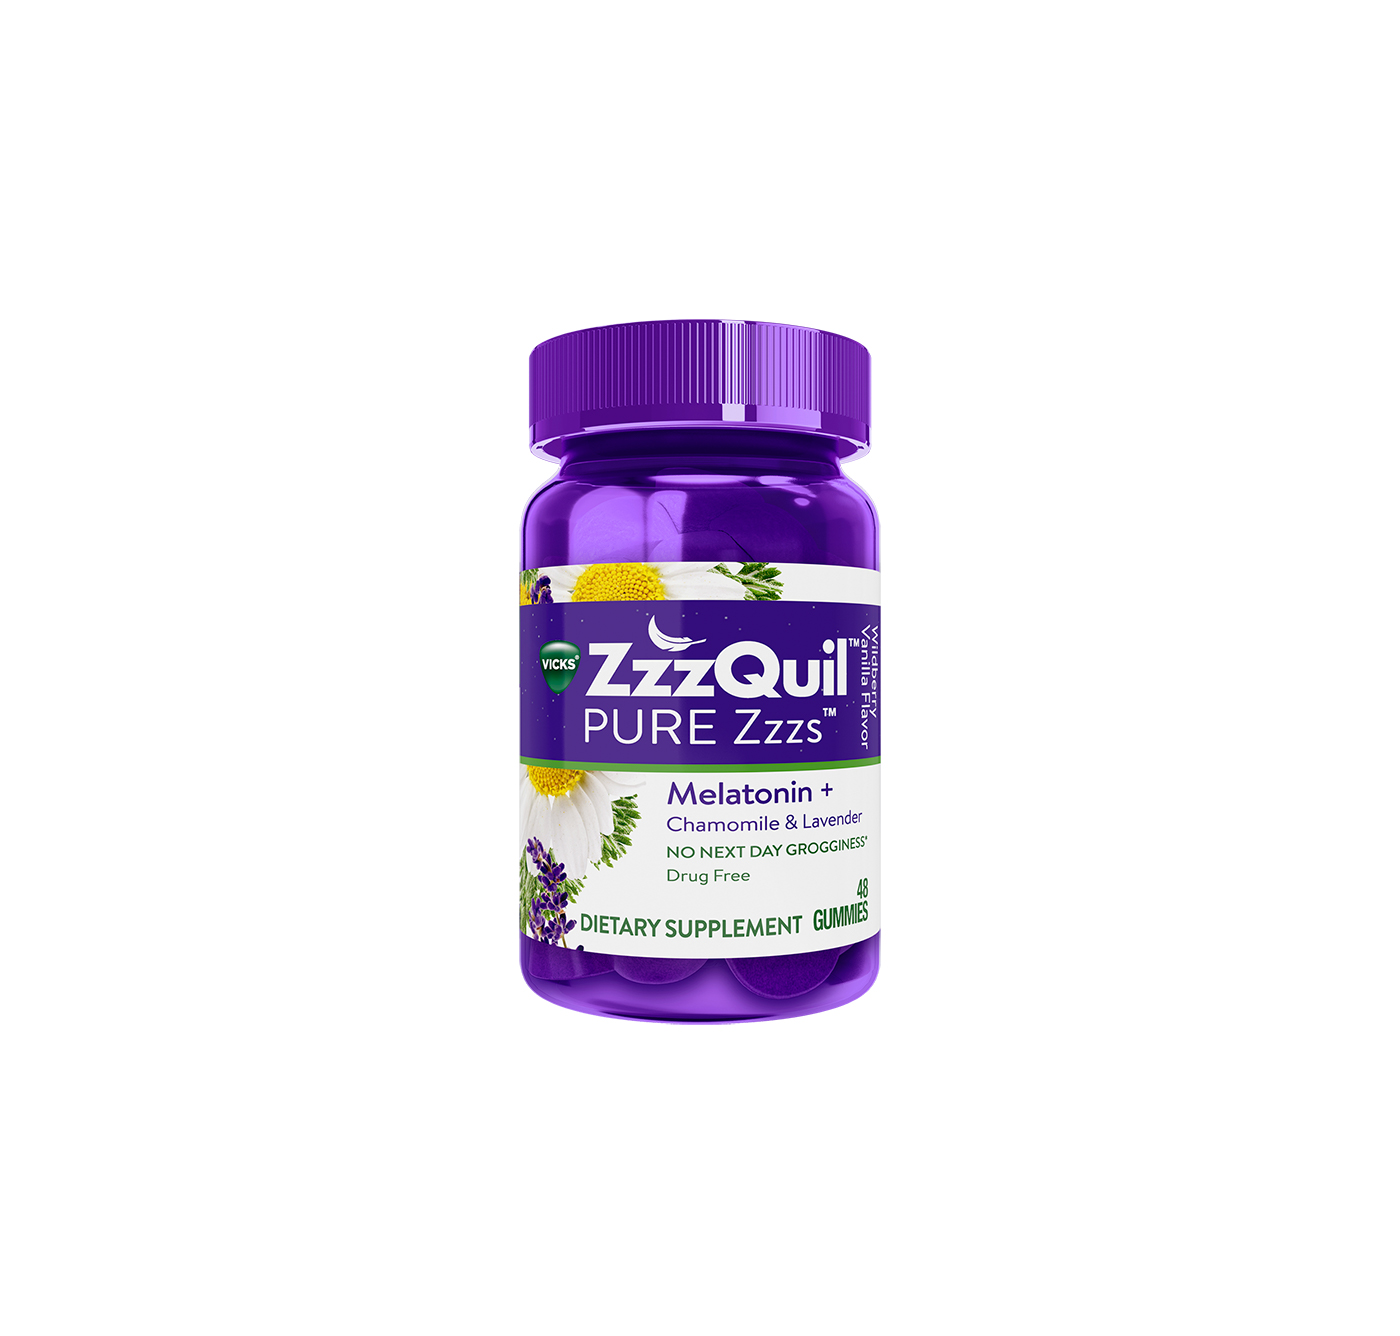 Cough Medicine, Cold Medicine, Flu Relief & Allergy Medicine